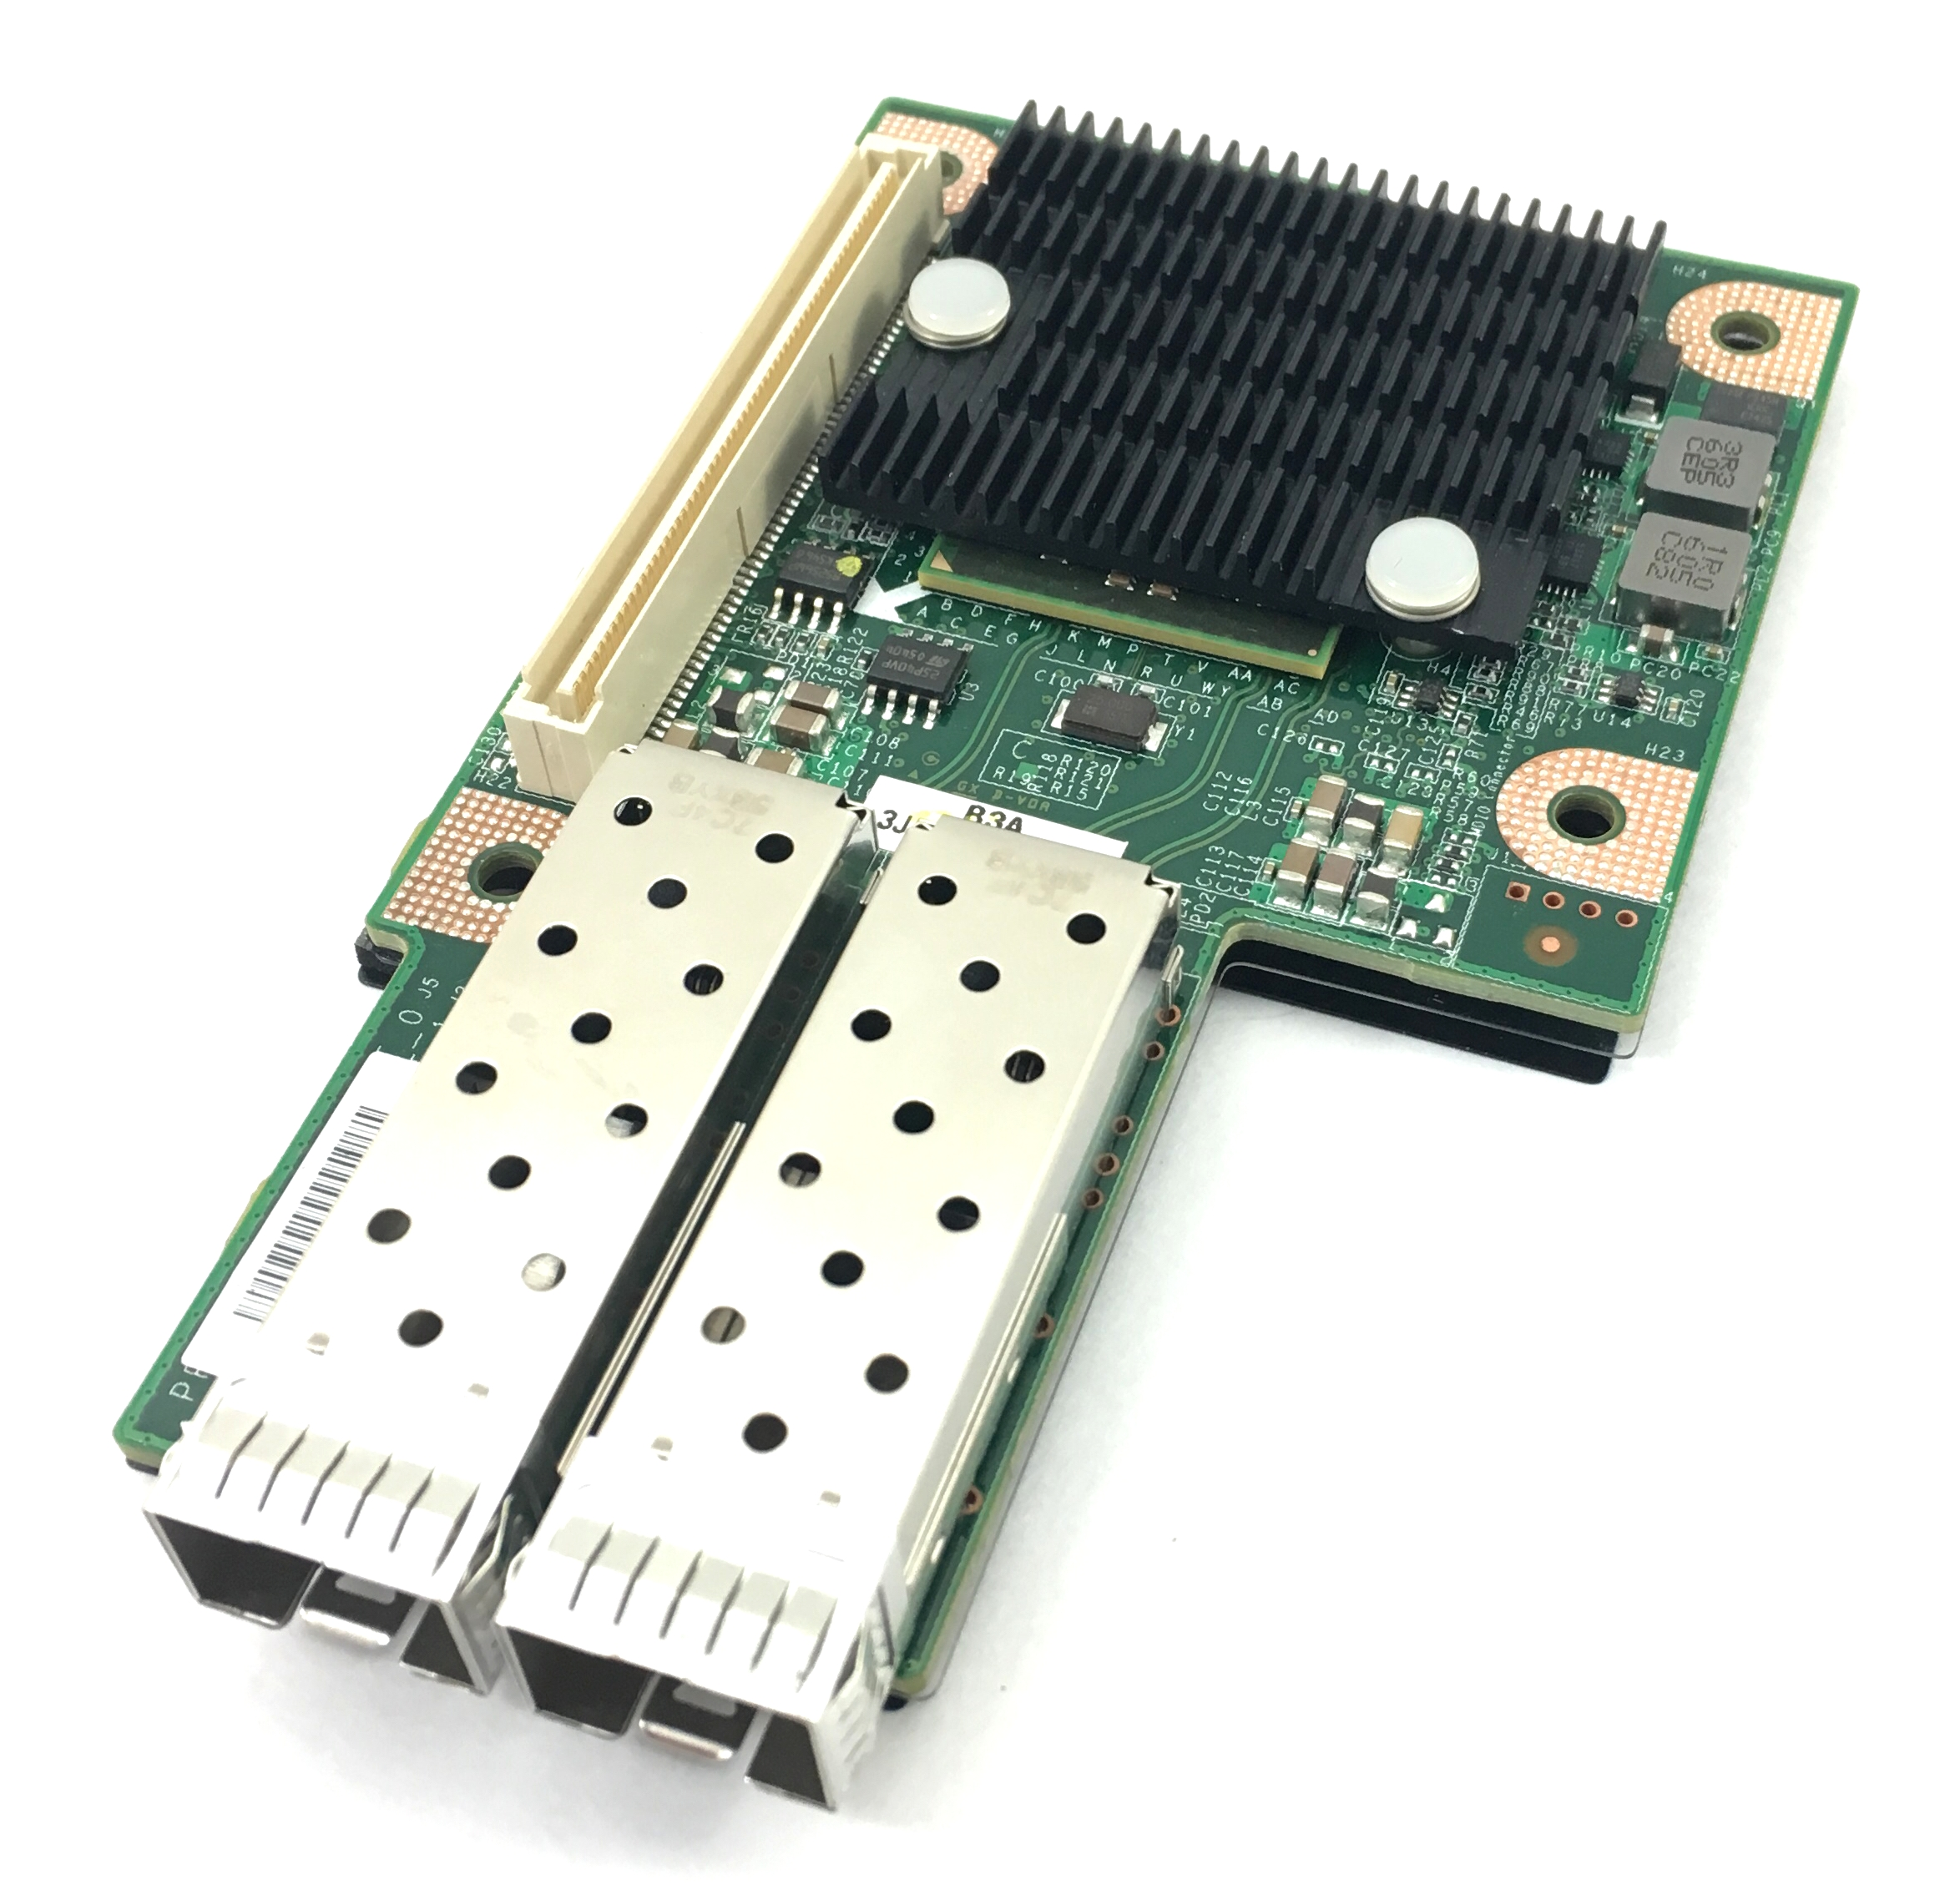 Quanta Dual SFP+ Port Mezzanine Card For Quantagrid D51B (DA0F03PC8B0)